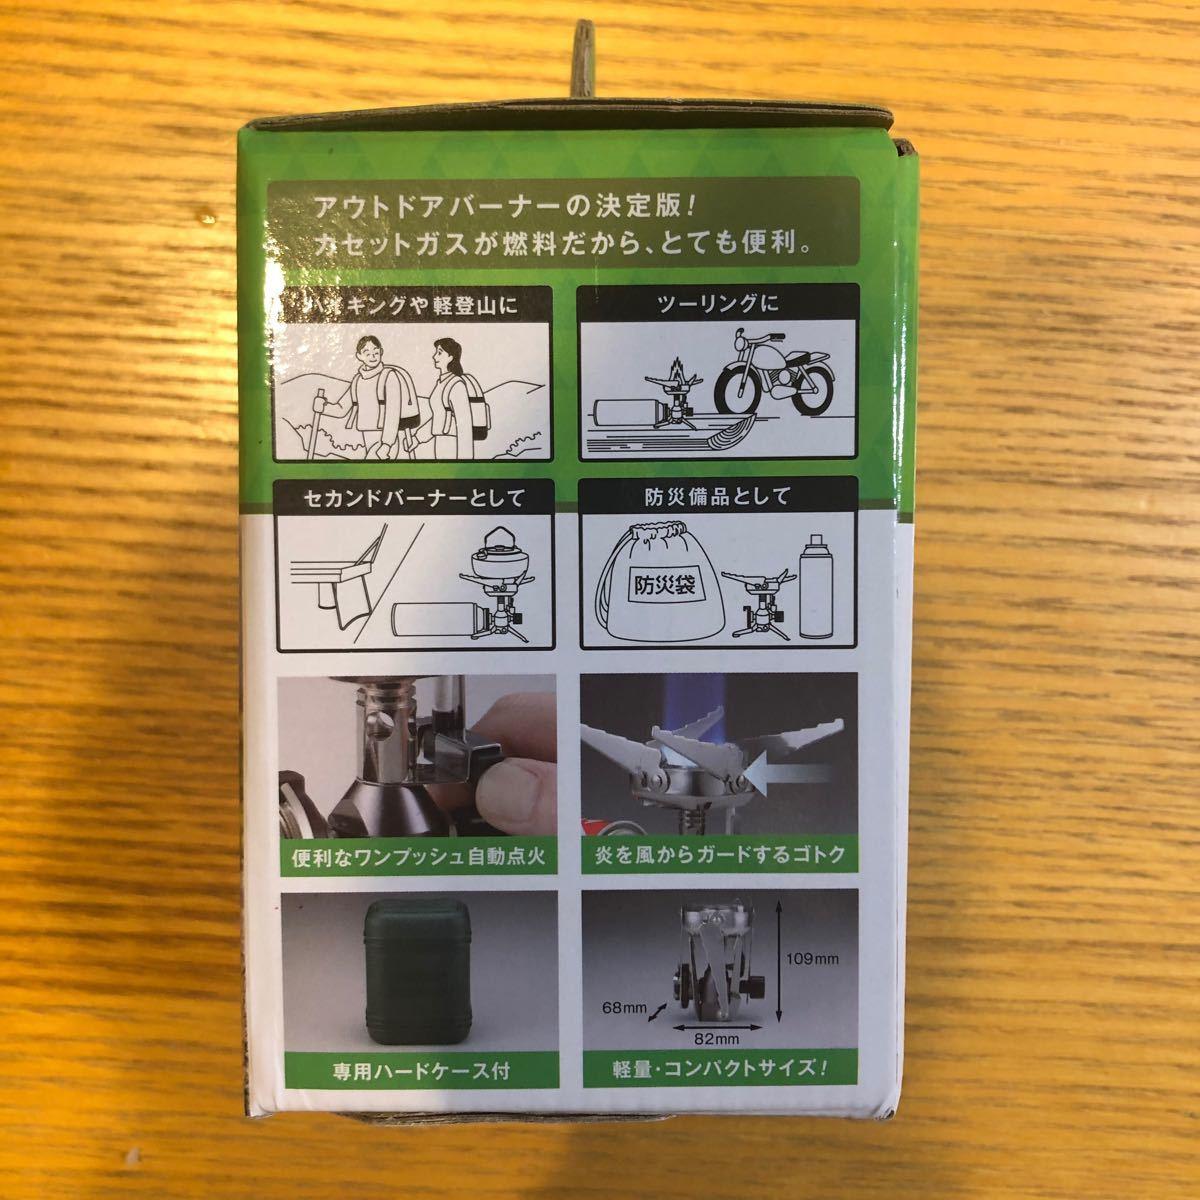 Iwatani イワタニカセットガス ジュニアコンパクトバーナー CB-JCB